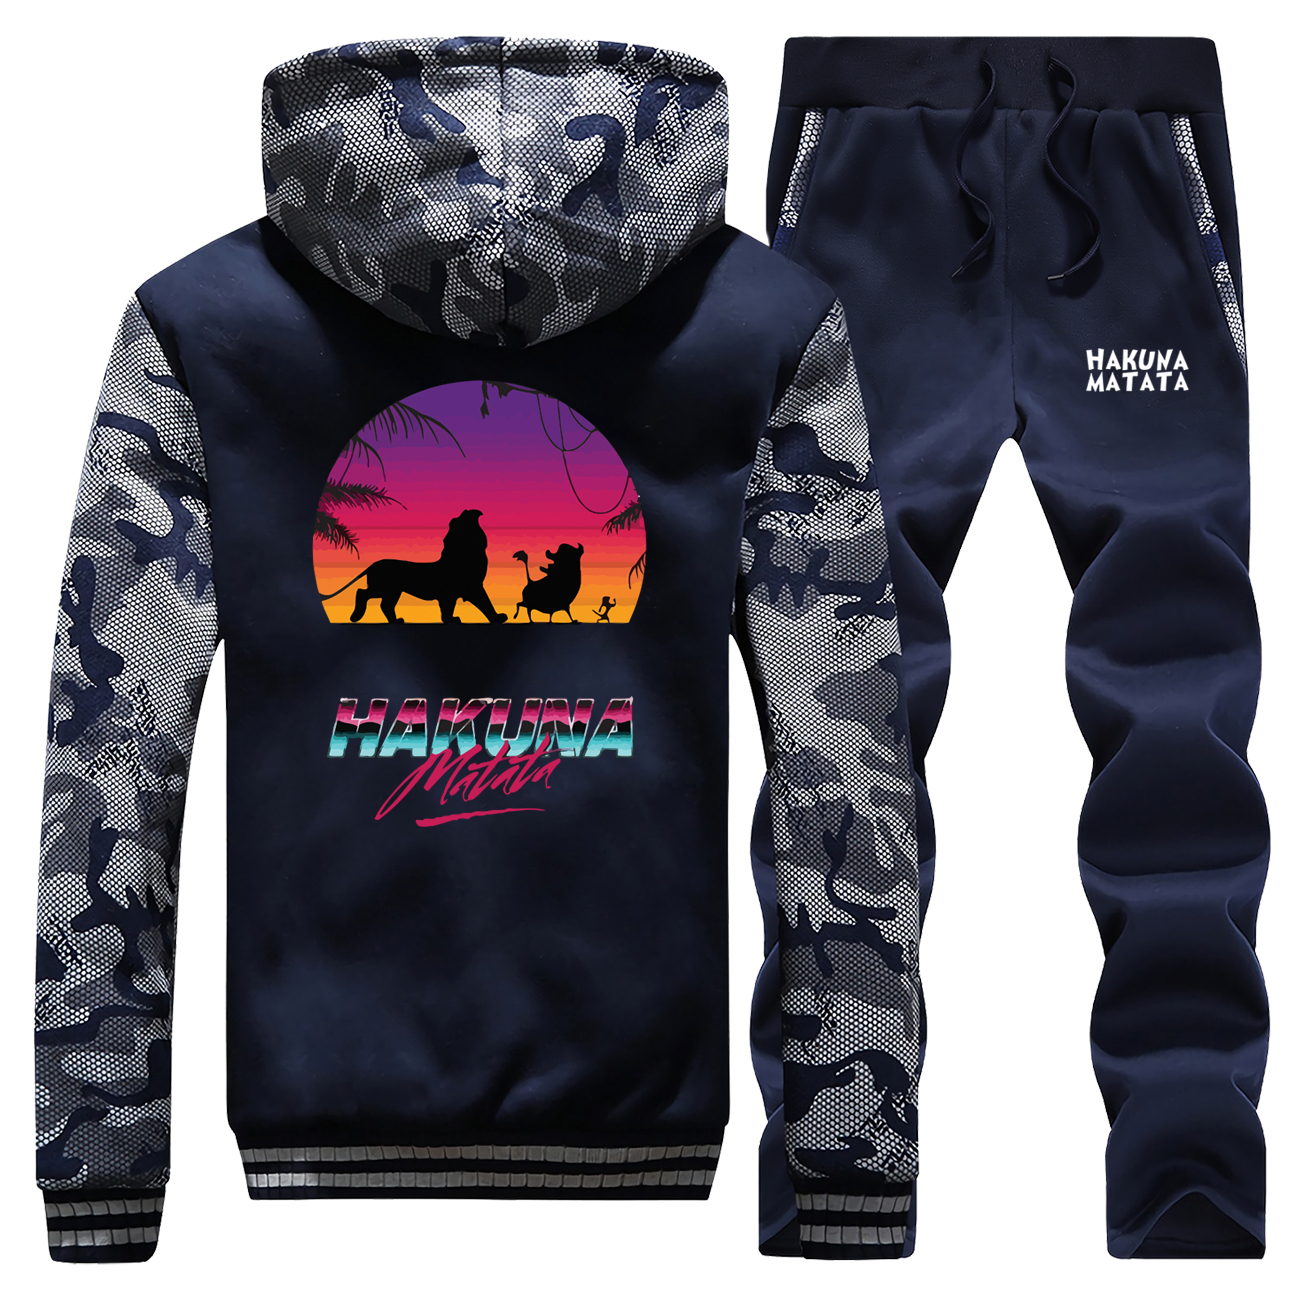 Hoodies Set Thick Fashion Jackets Hakuna Matata PUMBAA Pants Sweatshirt Punk Rock Casual Men's Sportswear Fleece Sportsman Wear